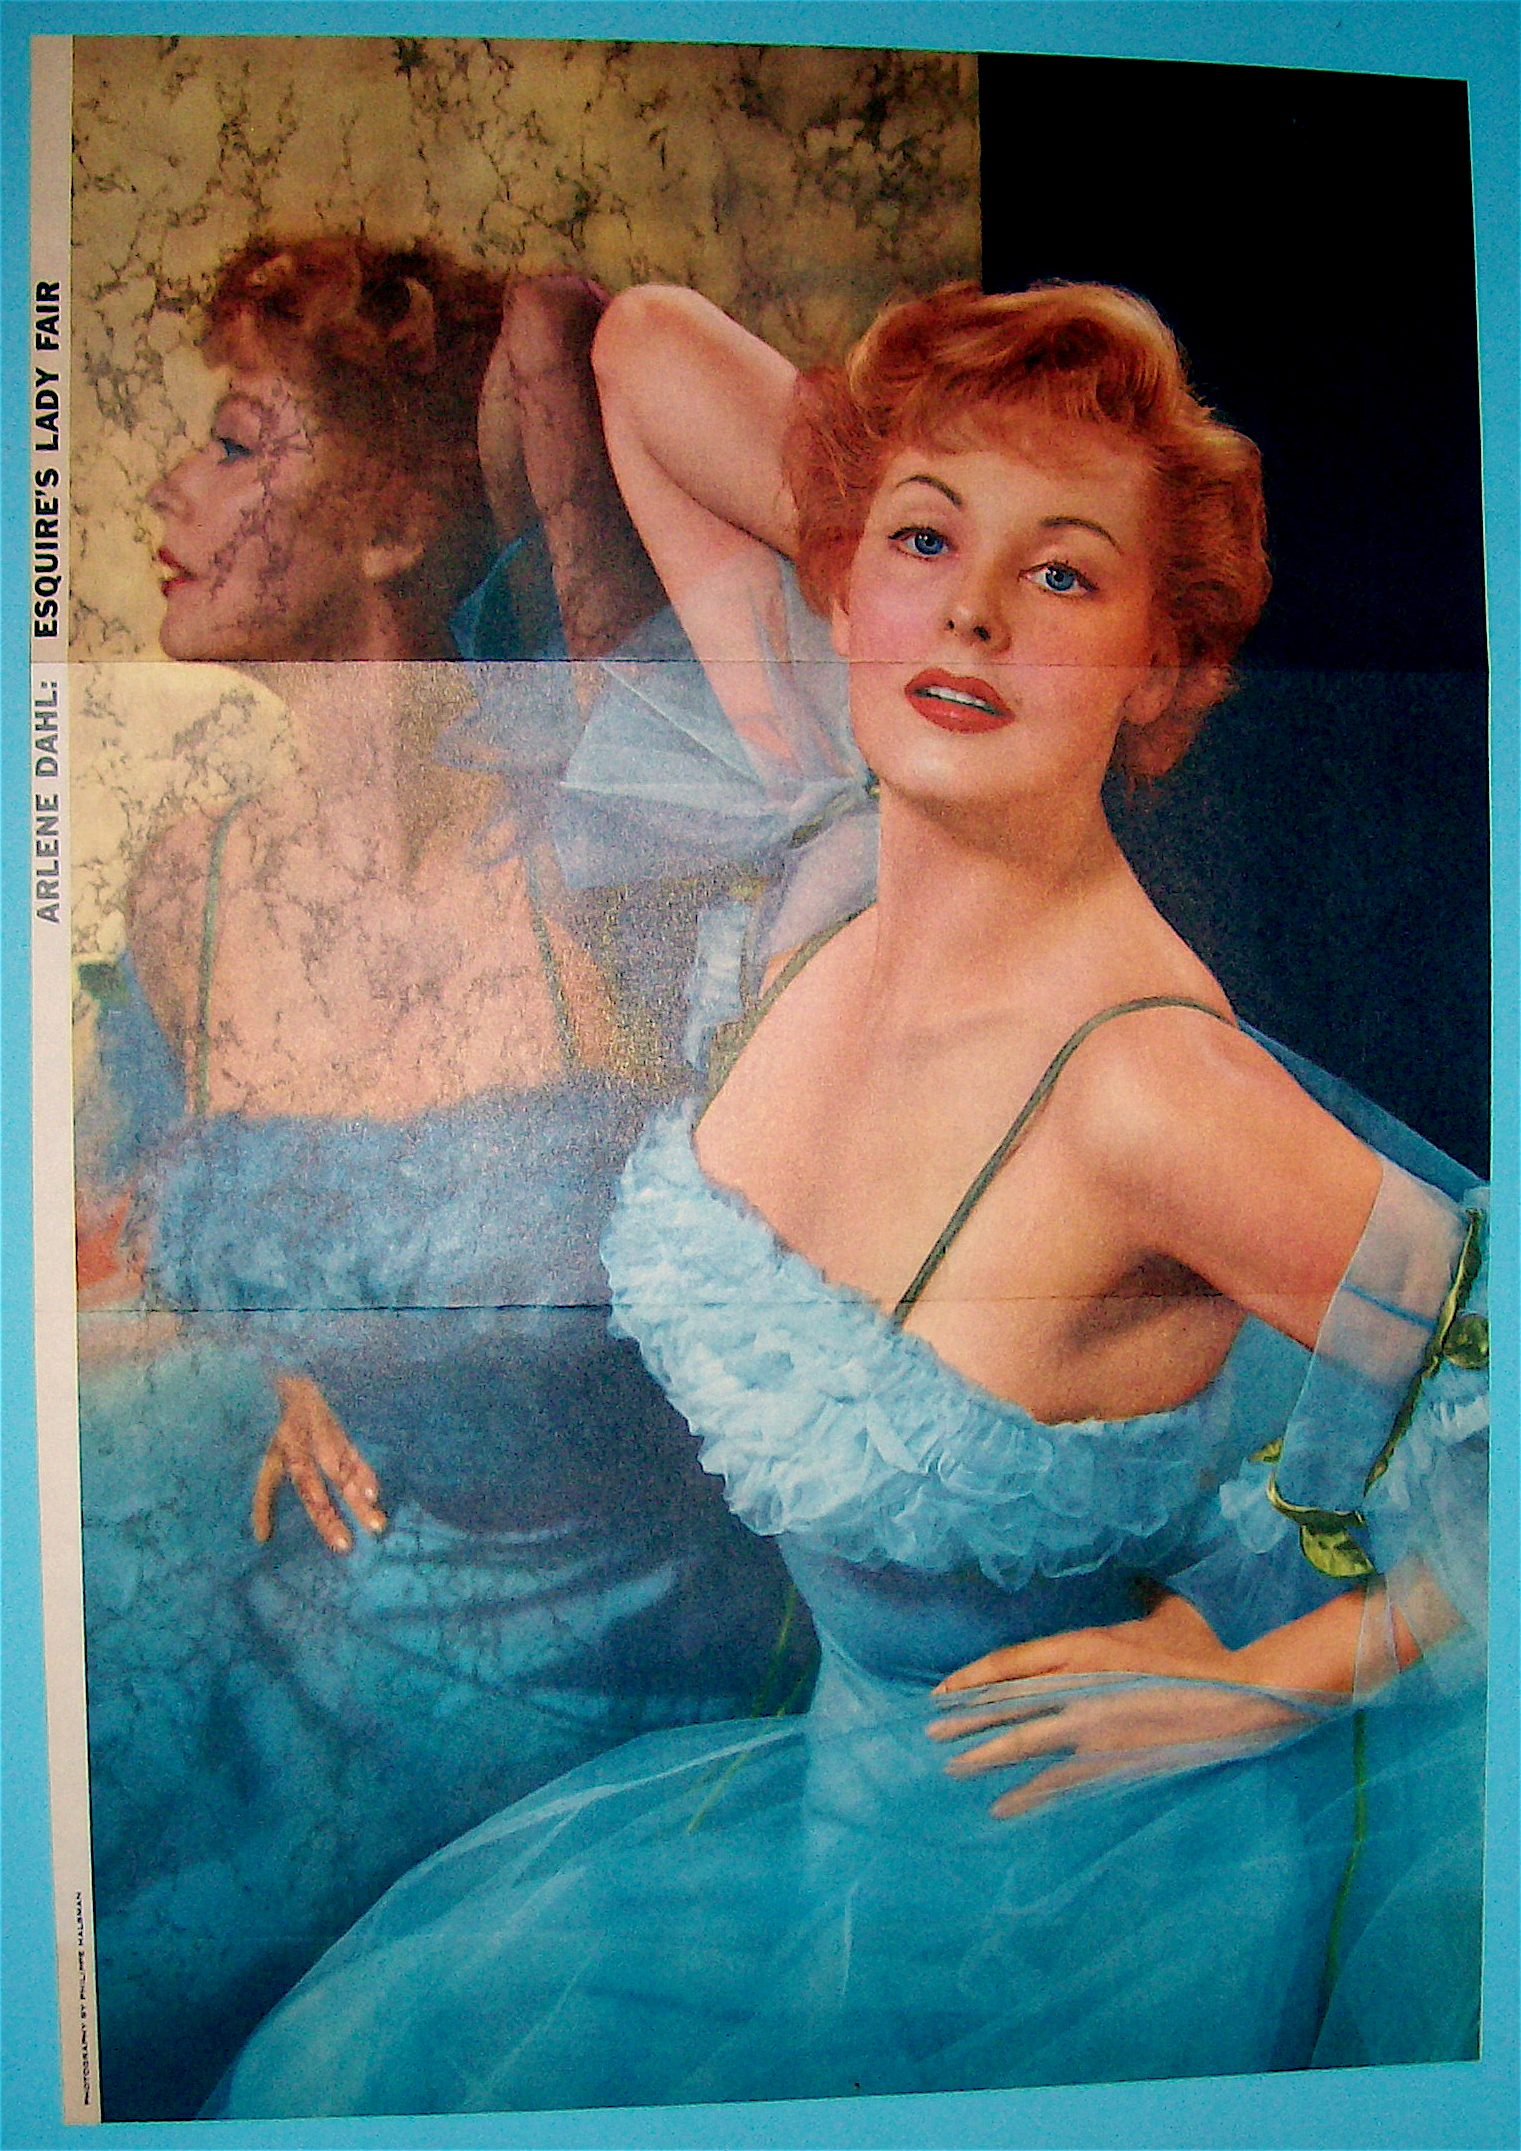 Esquire (Lady Fair) Pin Up Girl 1956 Arlene Dahl (Pinup